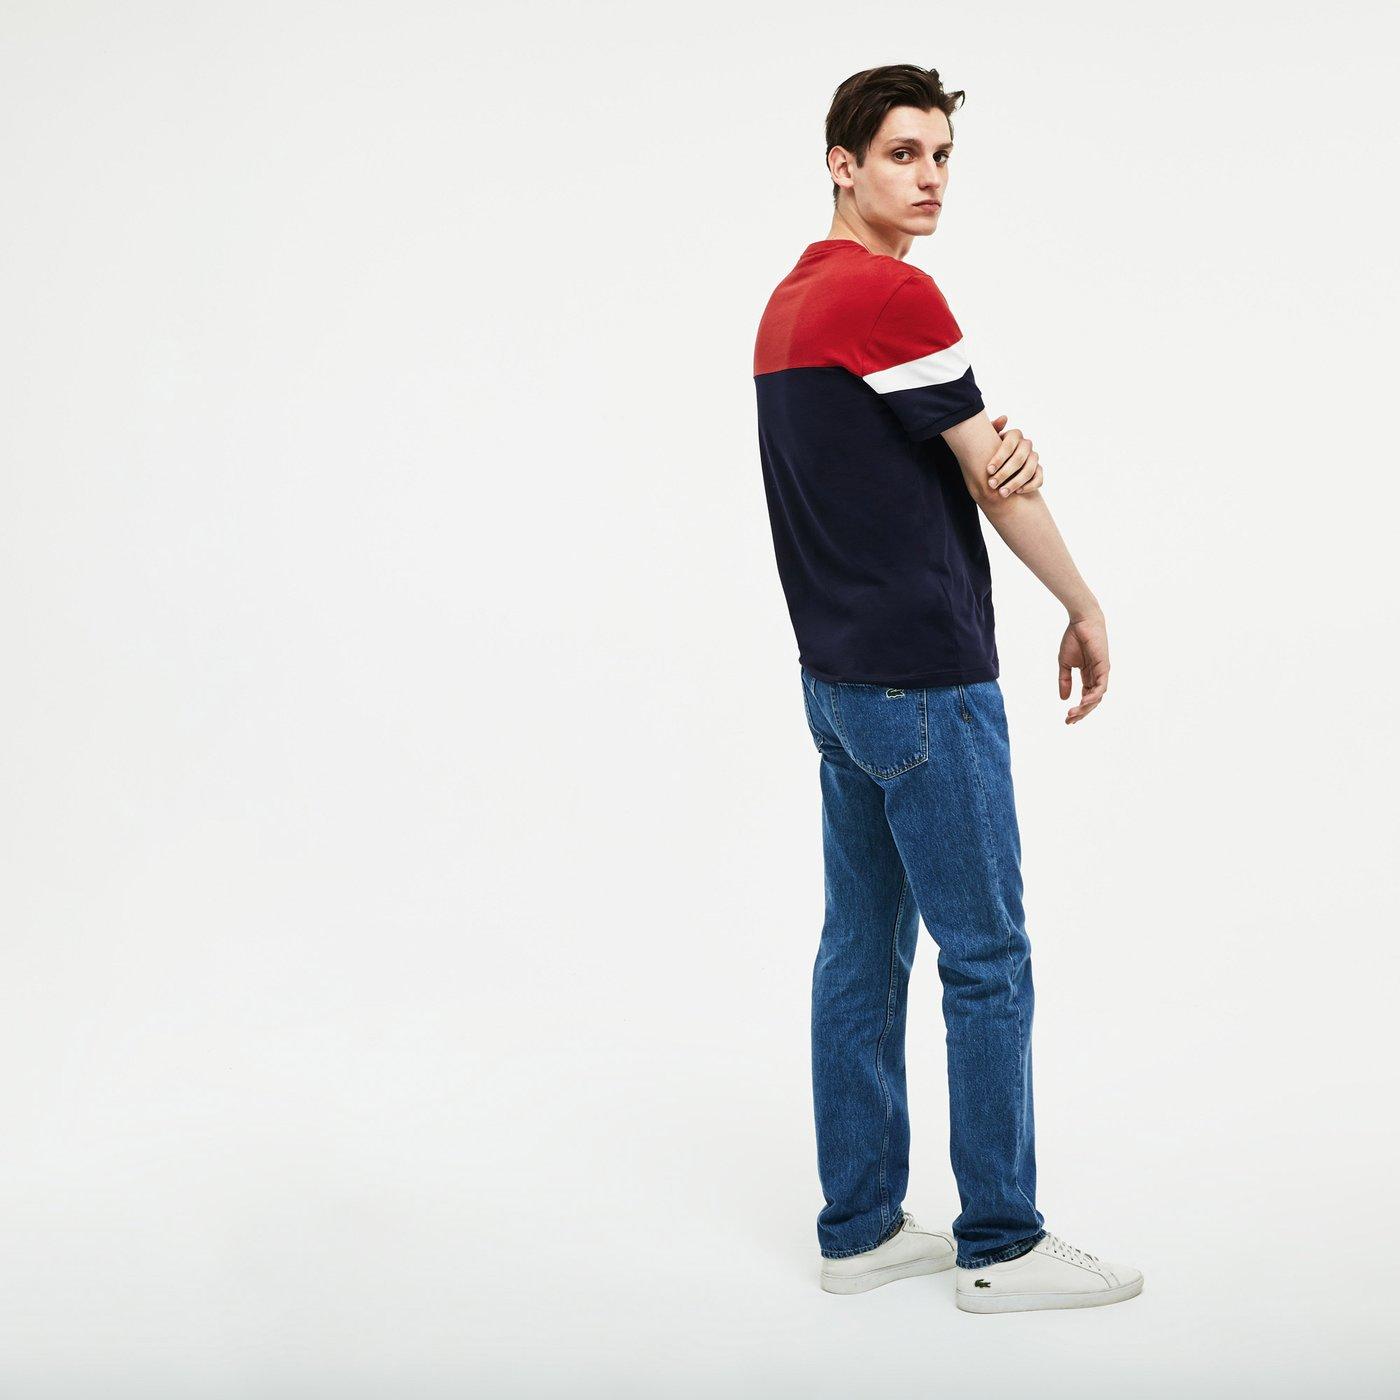 Lacoste Erkek Lacivert-Kırmızı T-Shirt